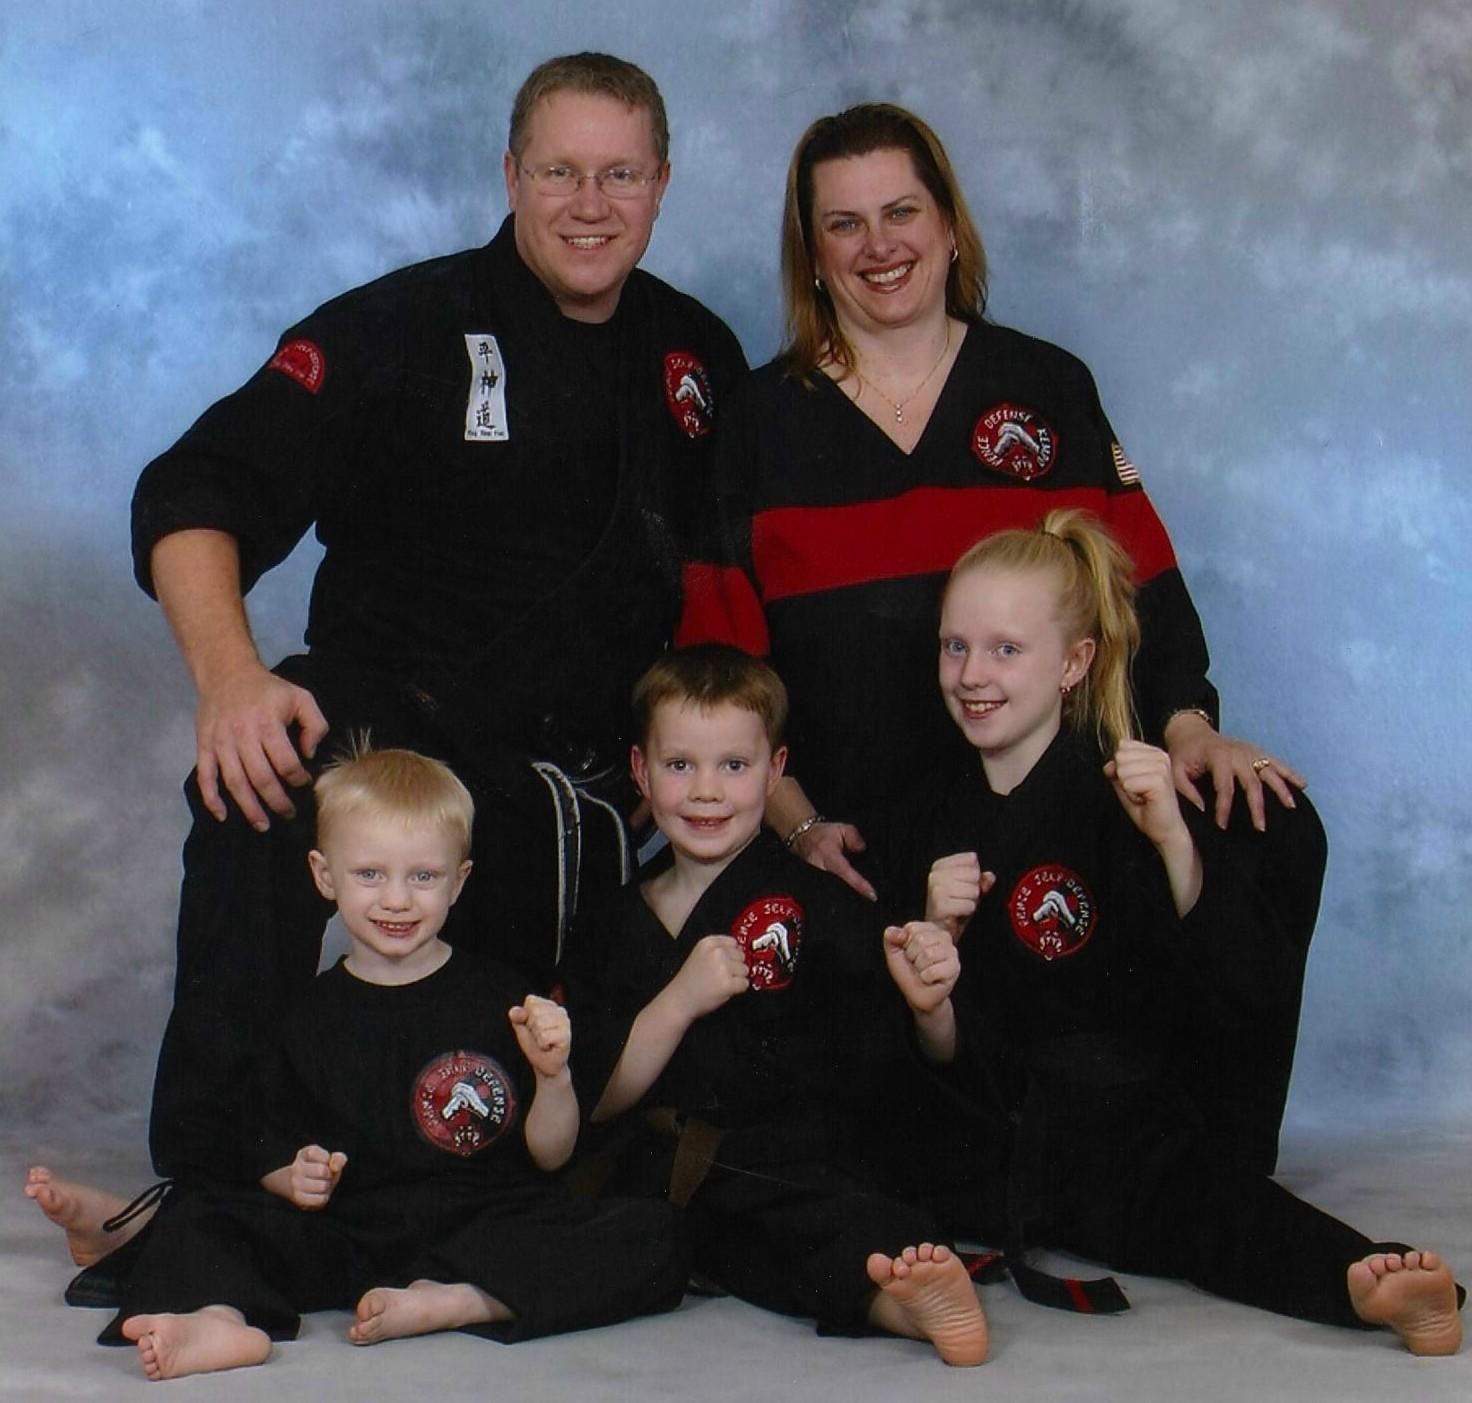 pencefamily2006.jpg